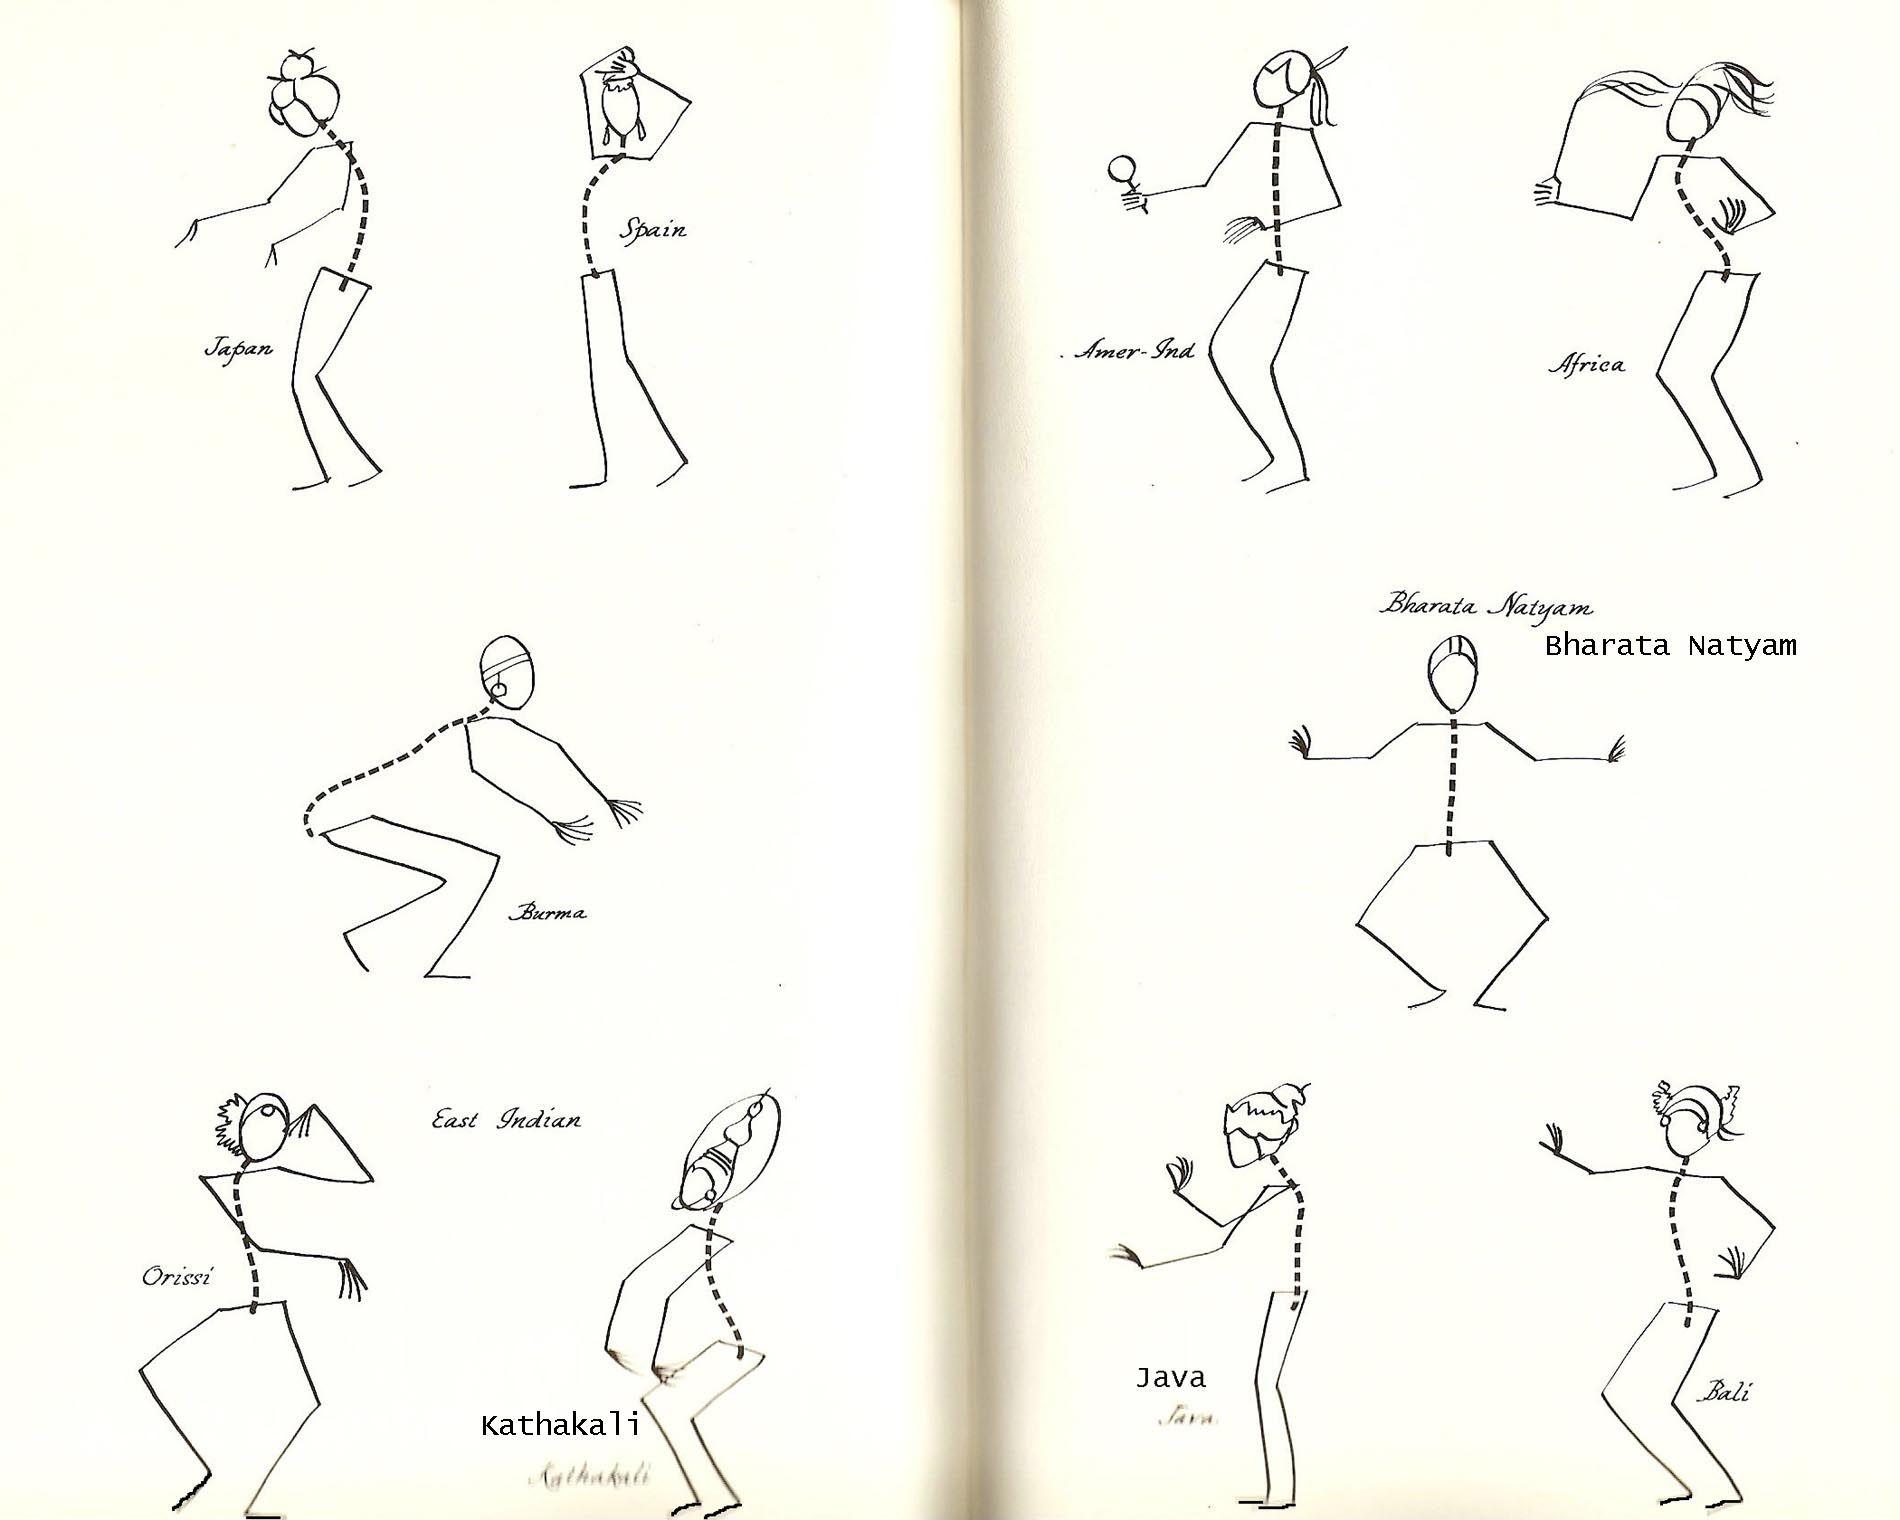 F Abf C D E Abe on Mambo Dance Steps Diagram